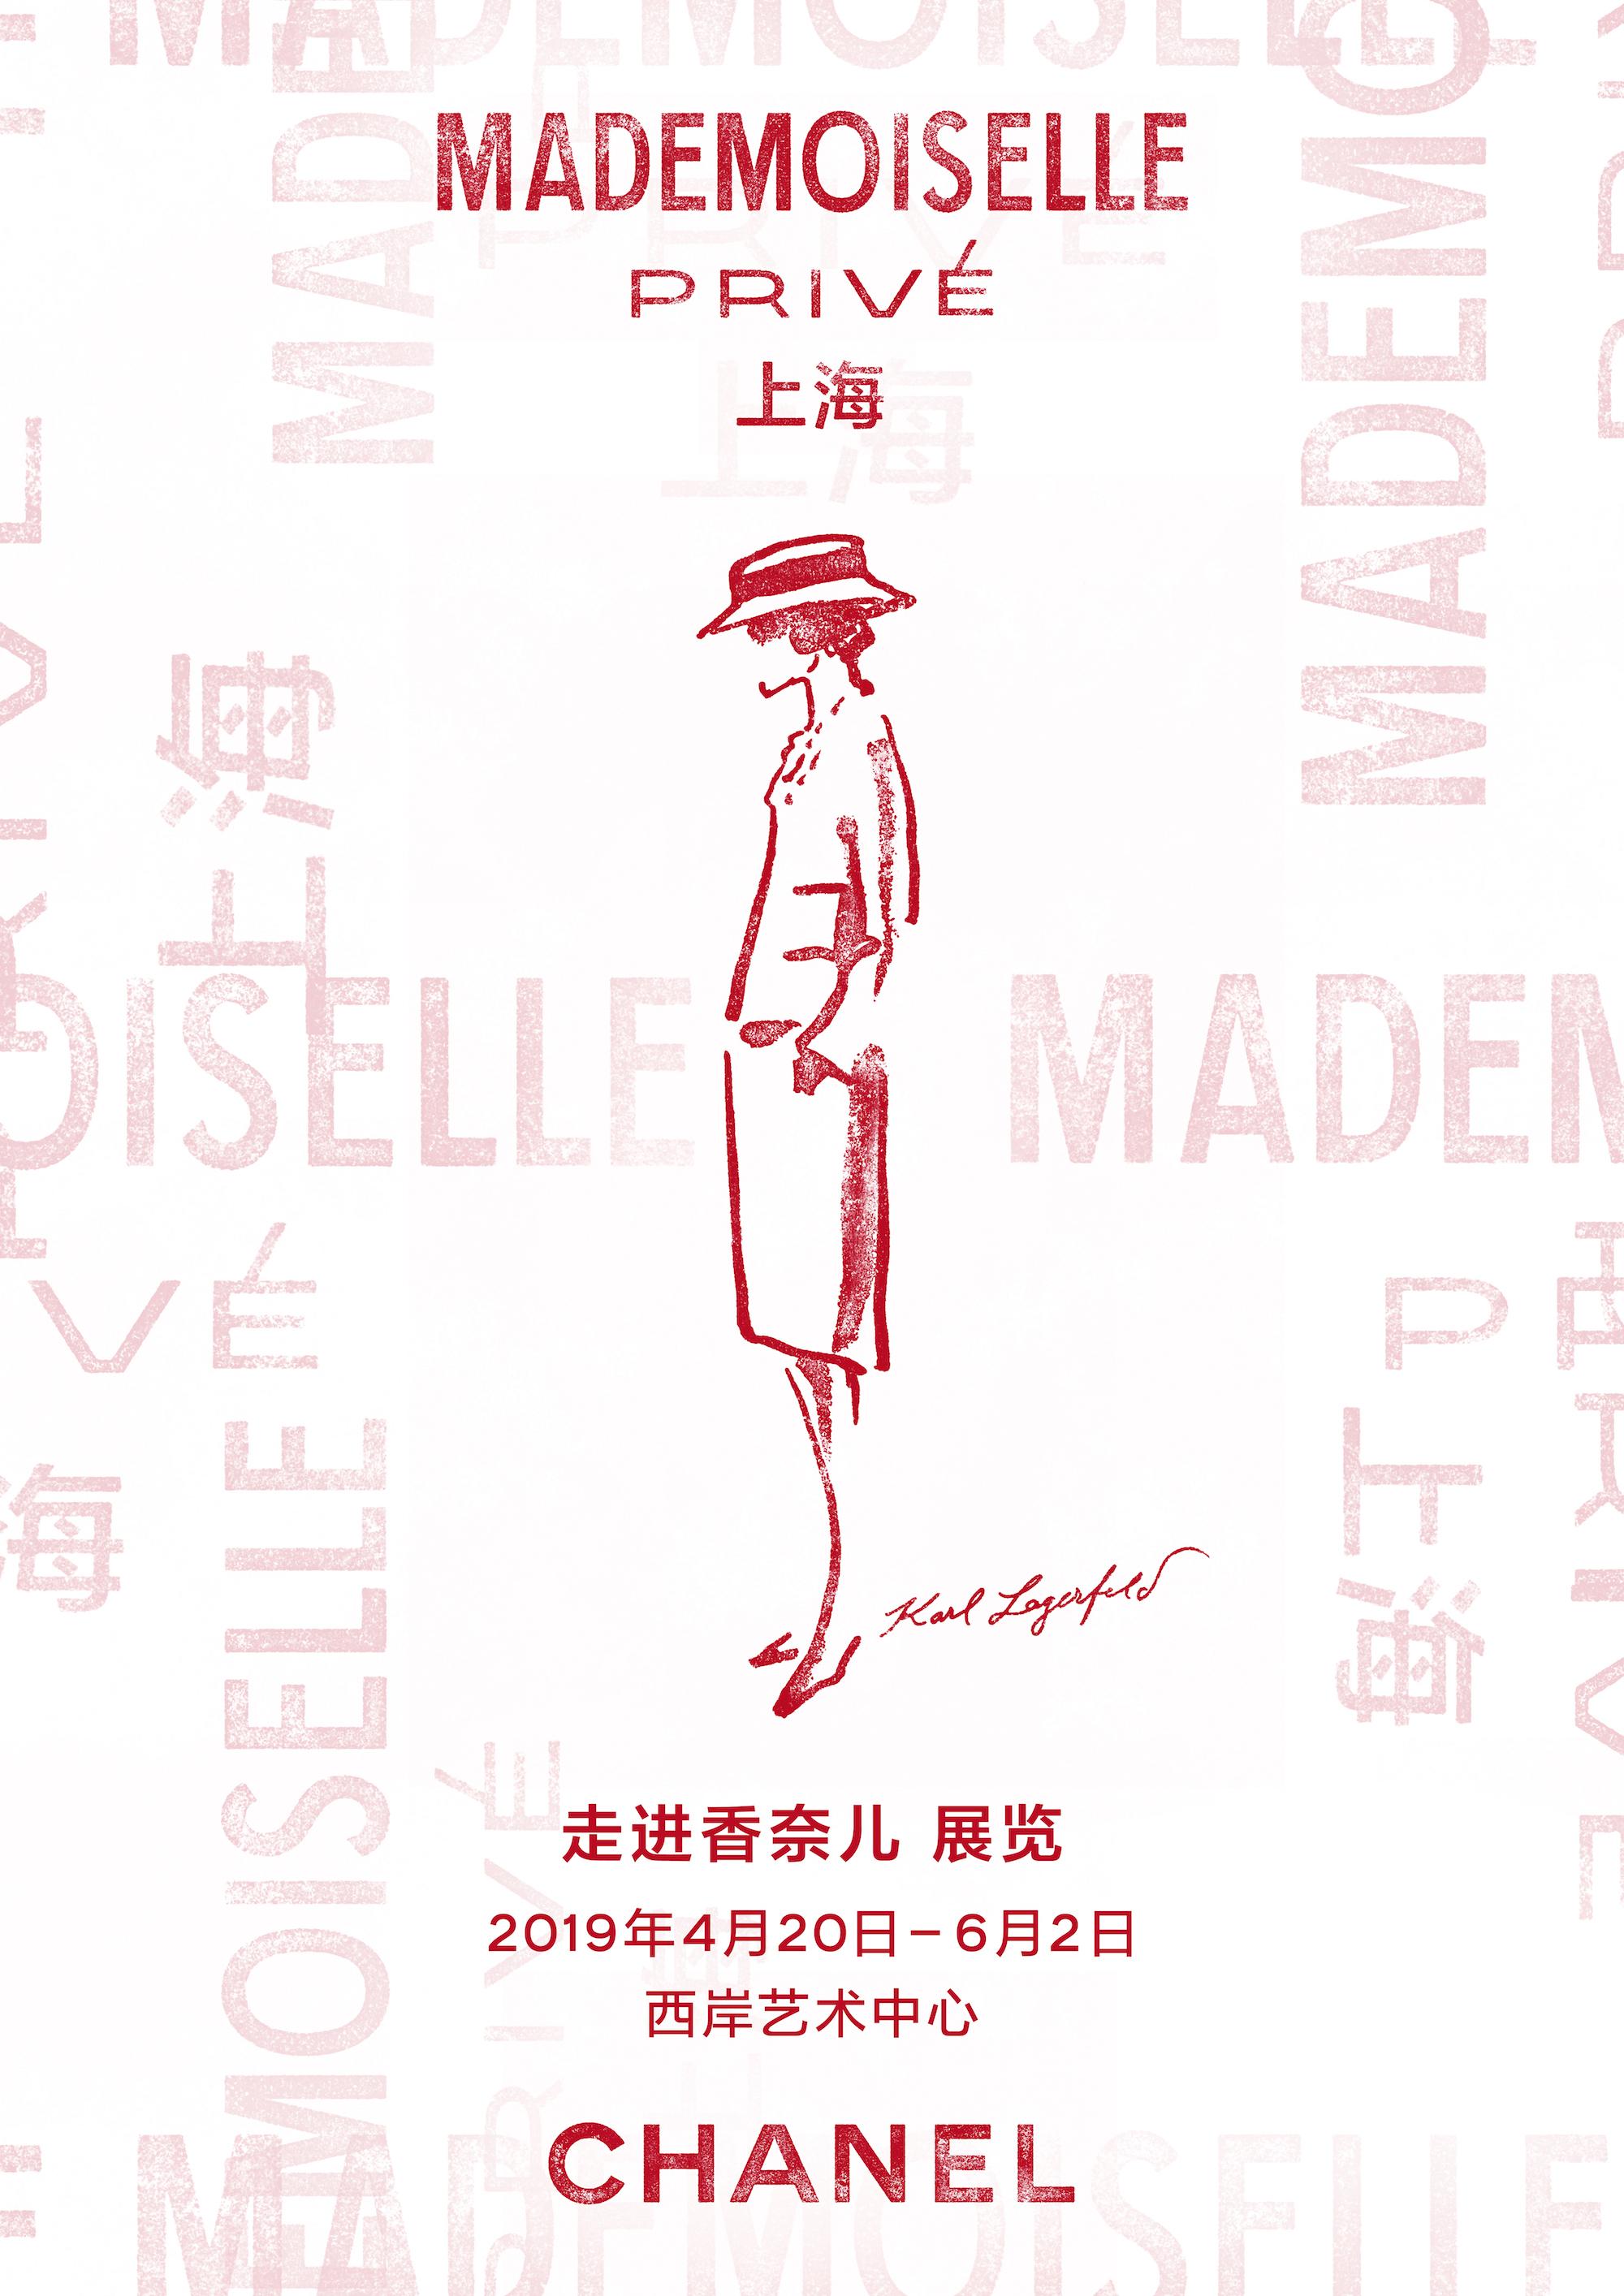 Chanel 宣布将于上海举办《Mademoiselle Privé》展览